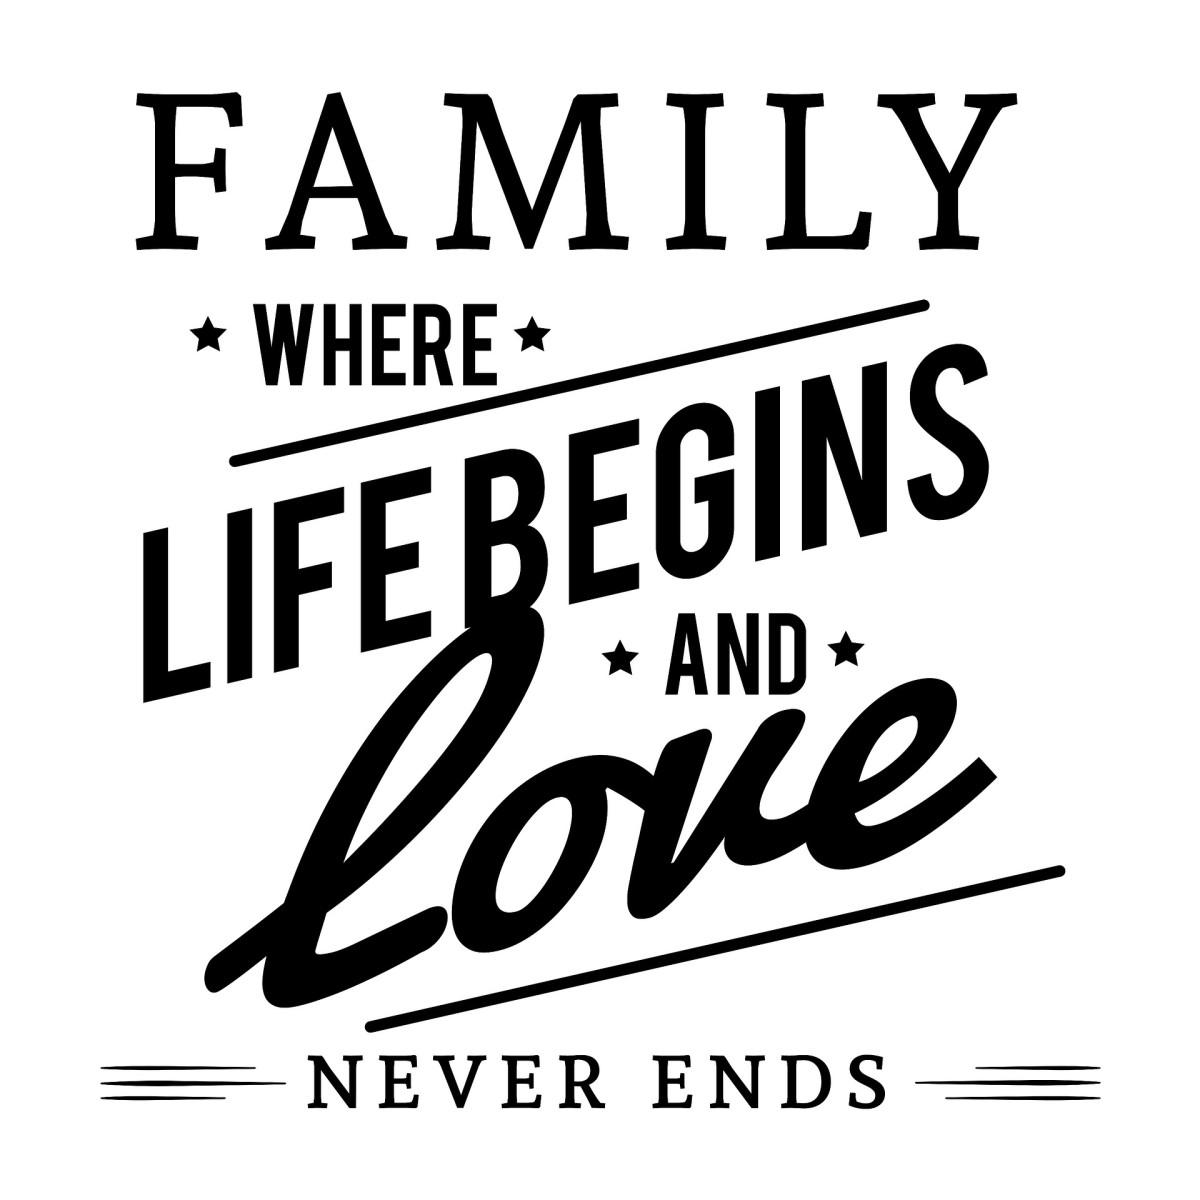 Memories of My Family